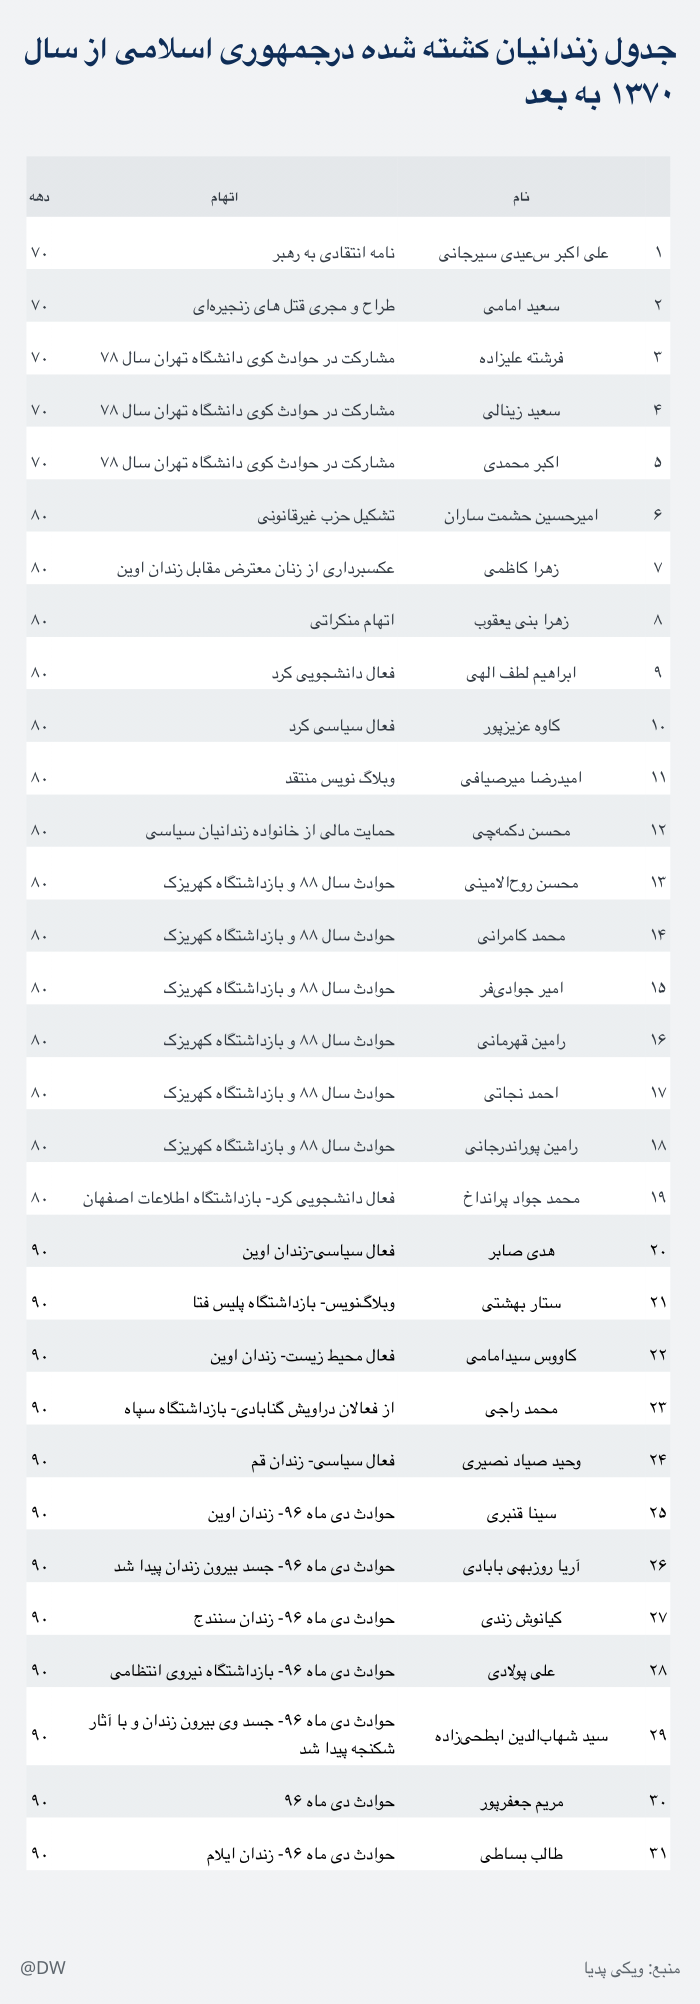 Tabelle Infografik Folter Iran FAR